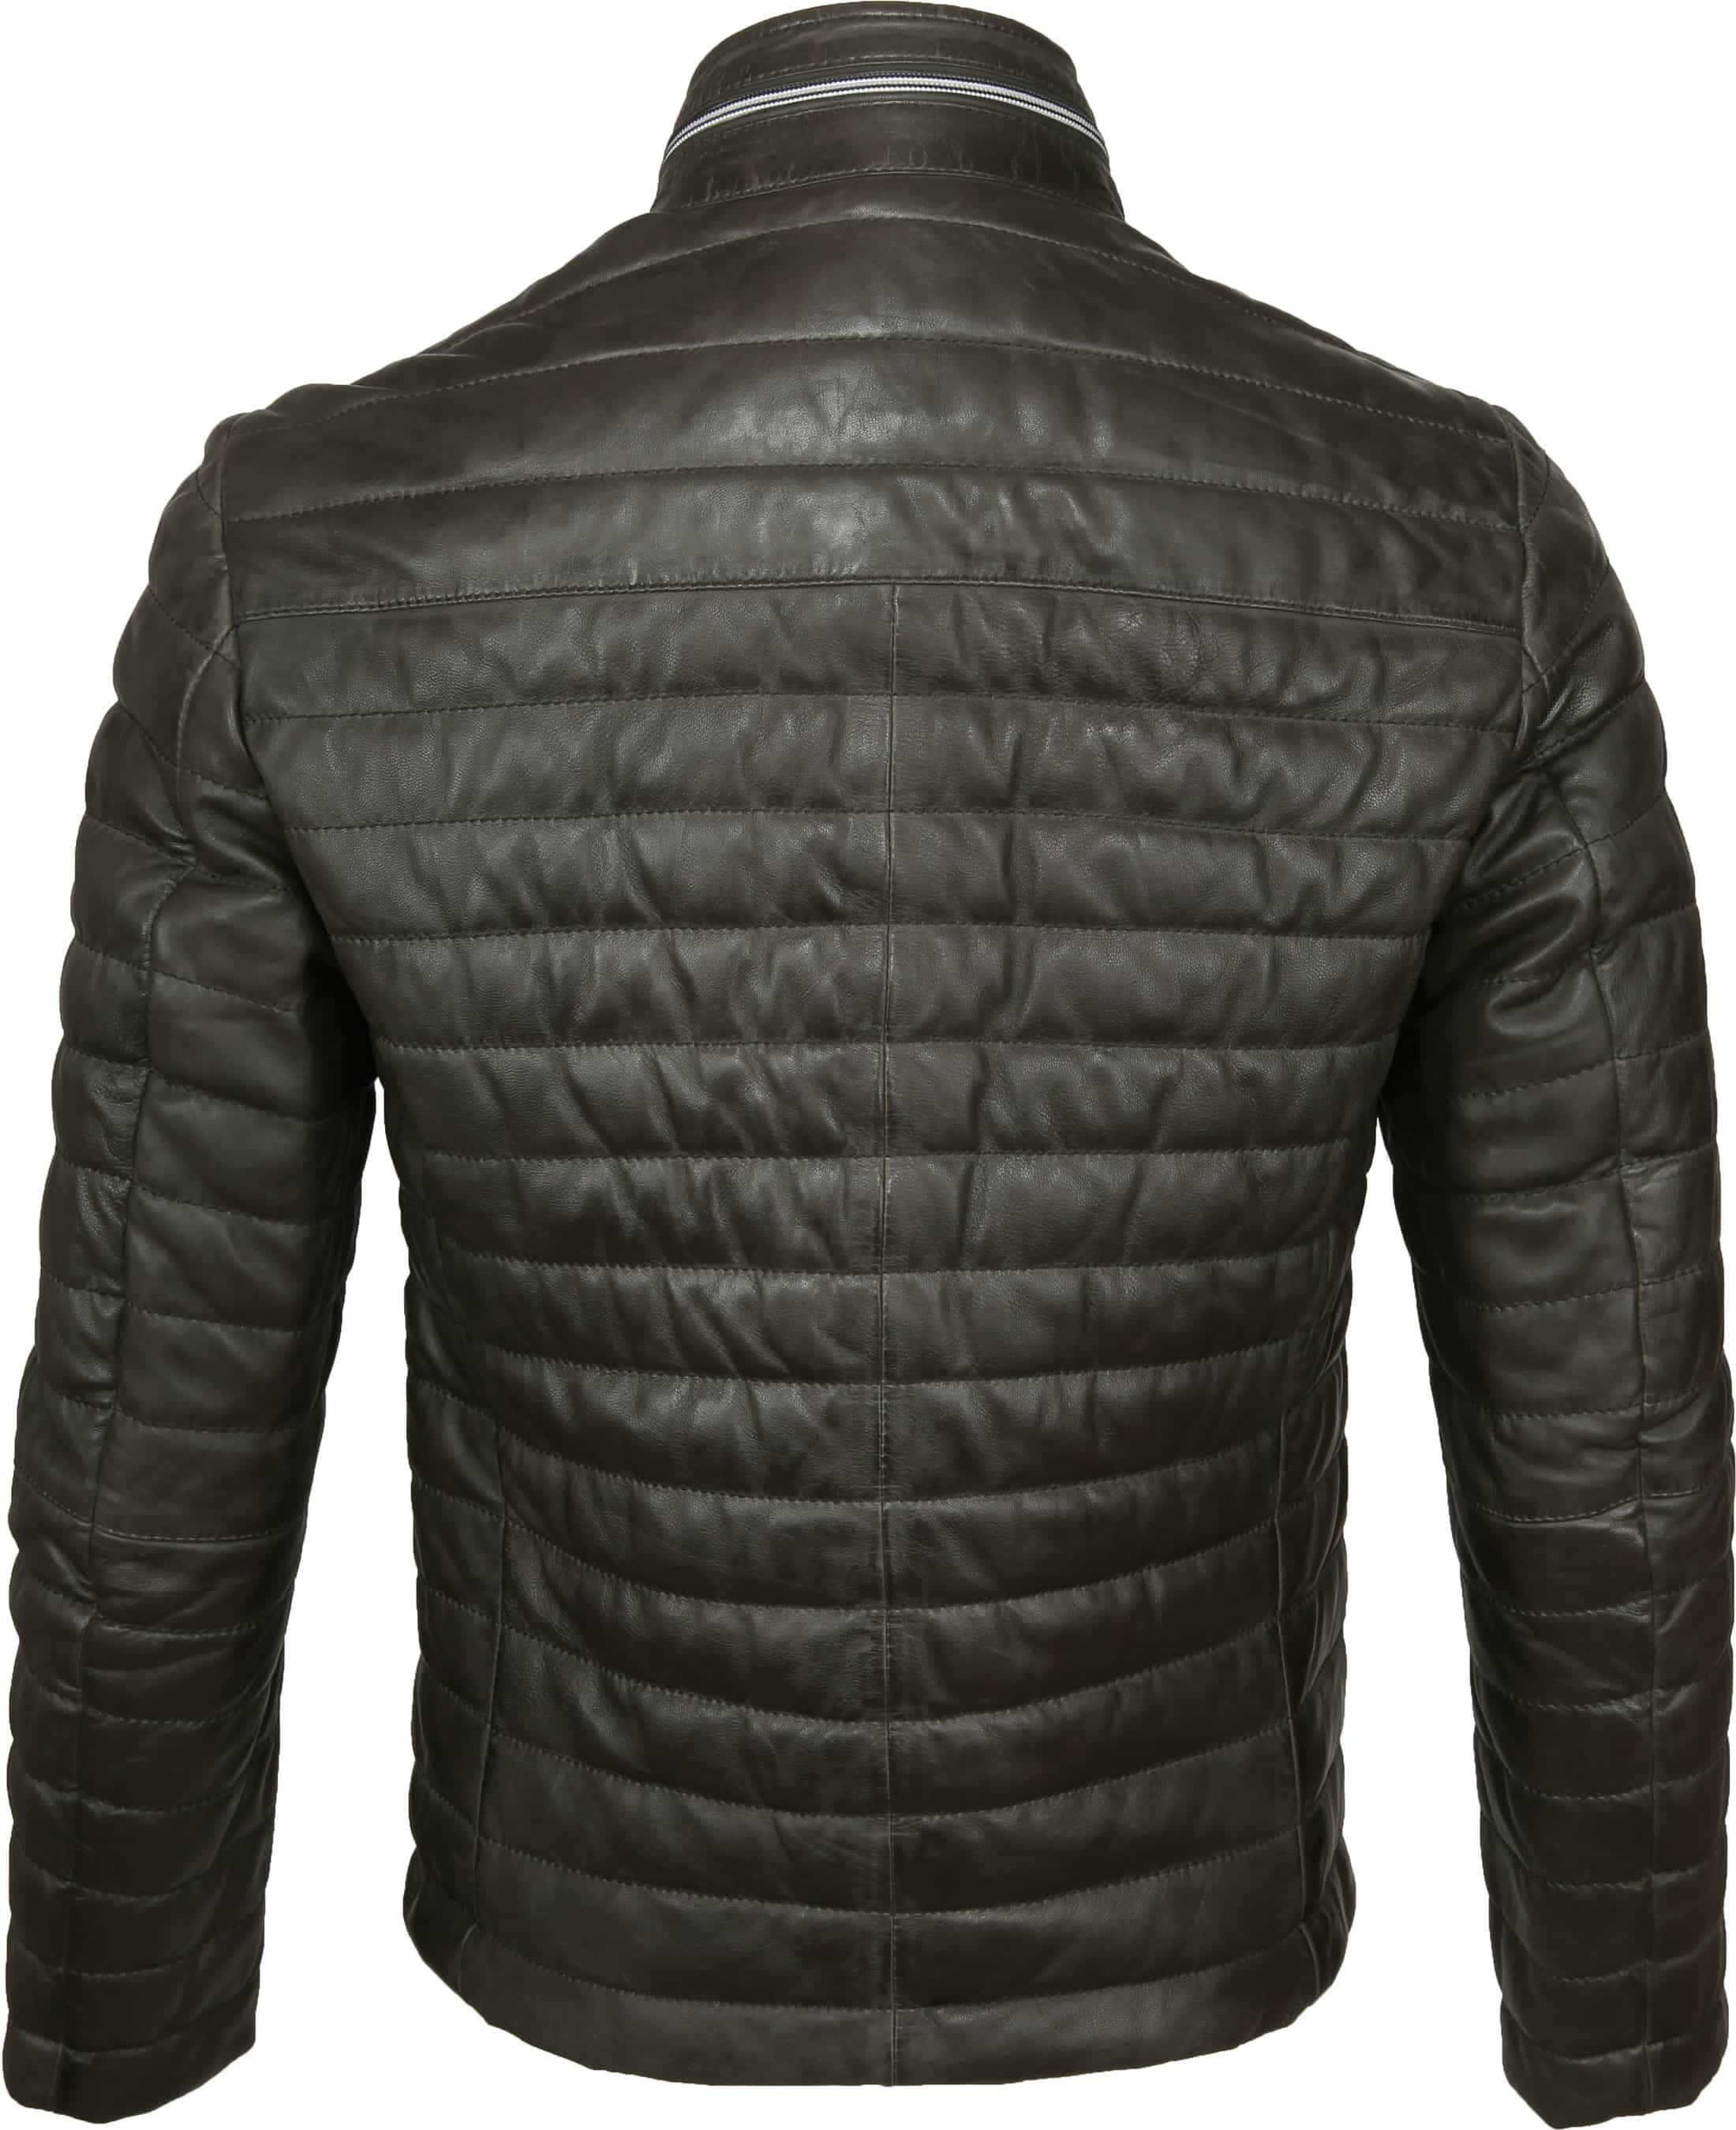 Milestone Tereno Leather Jacket Dark Green foto 5